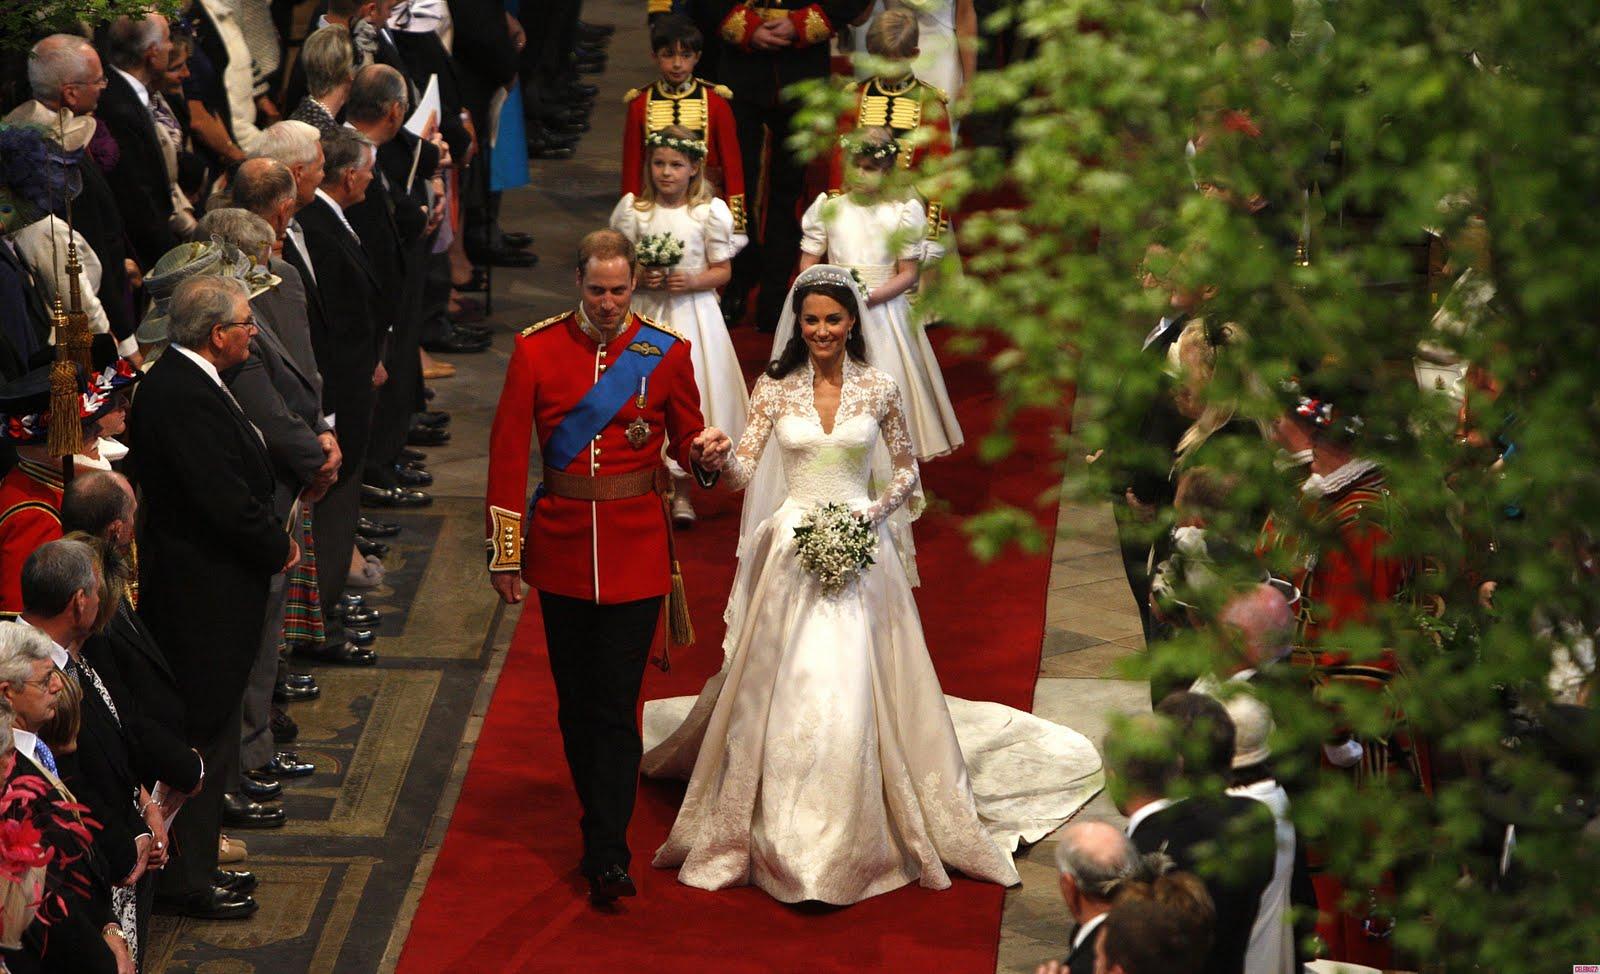 royal wedding westminster abbey photos 3888x2368 - A Royal Wedding Movie